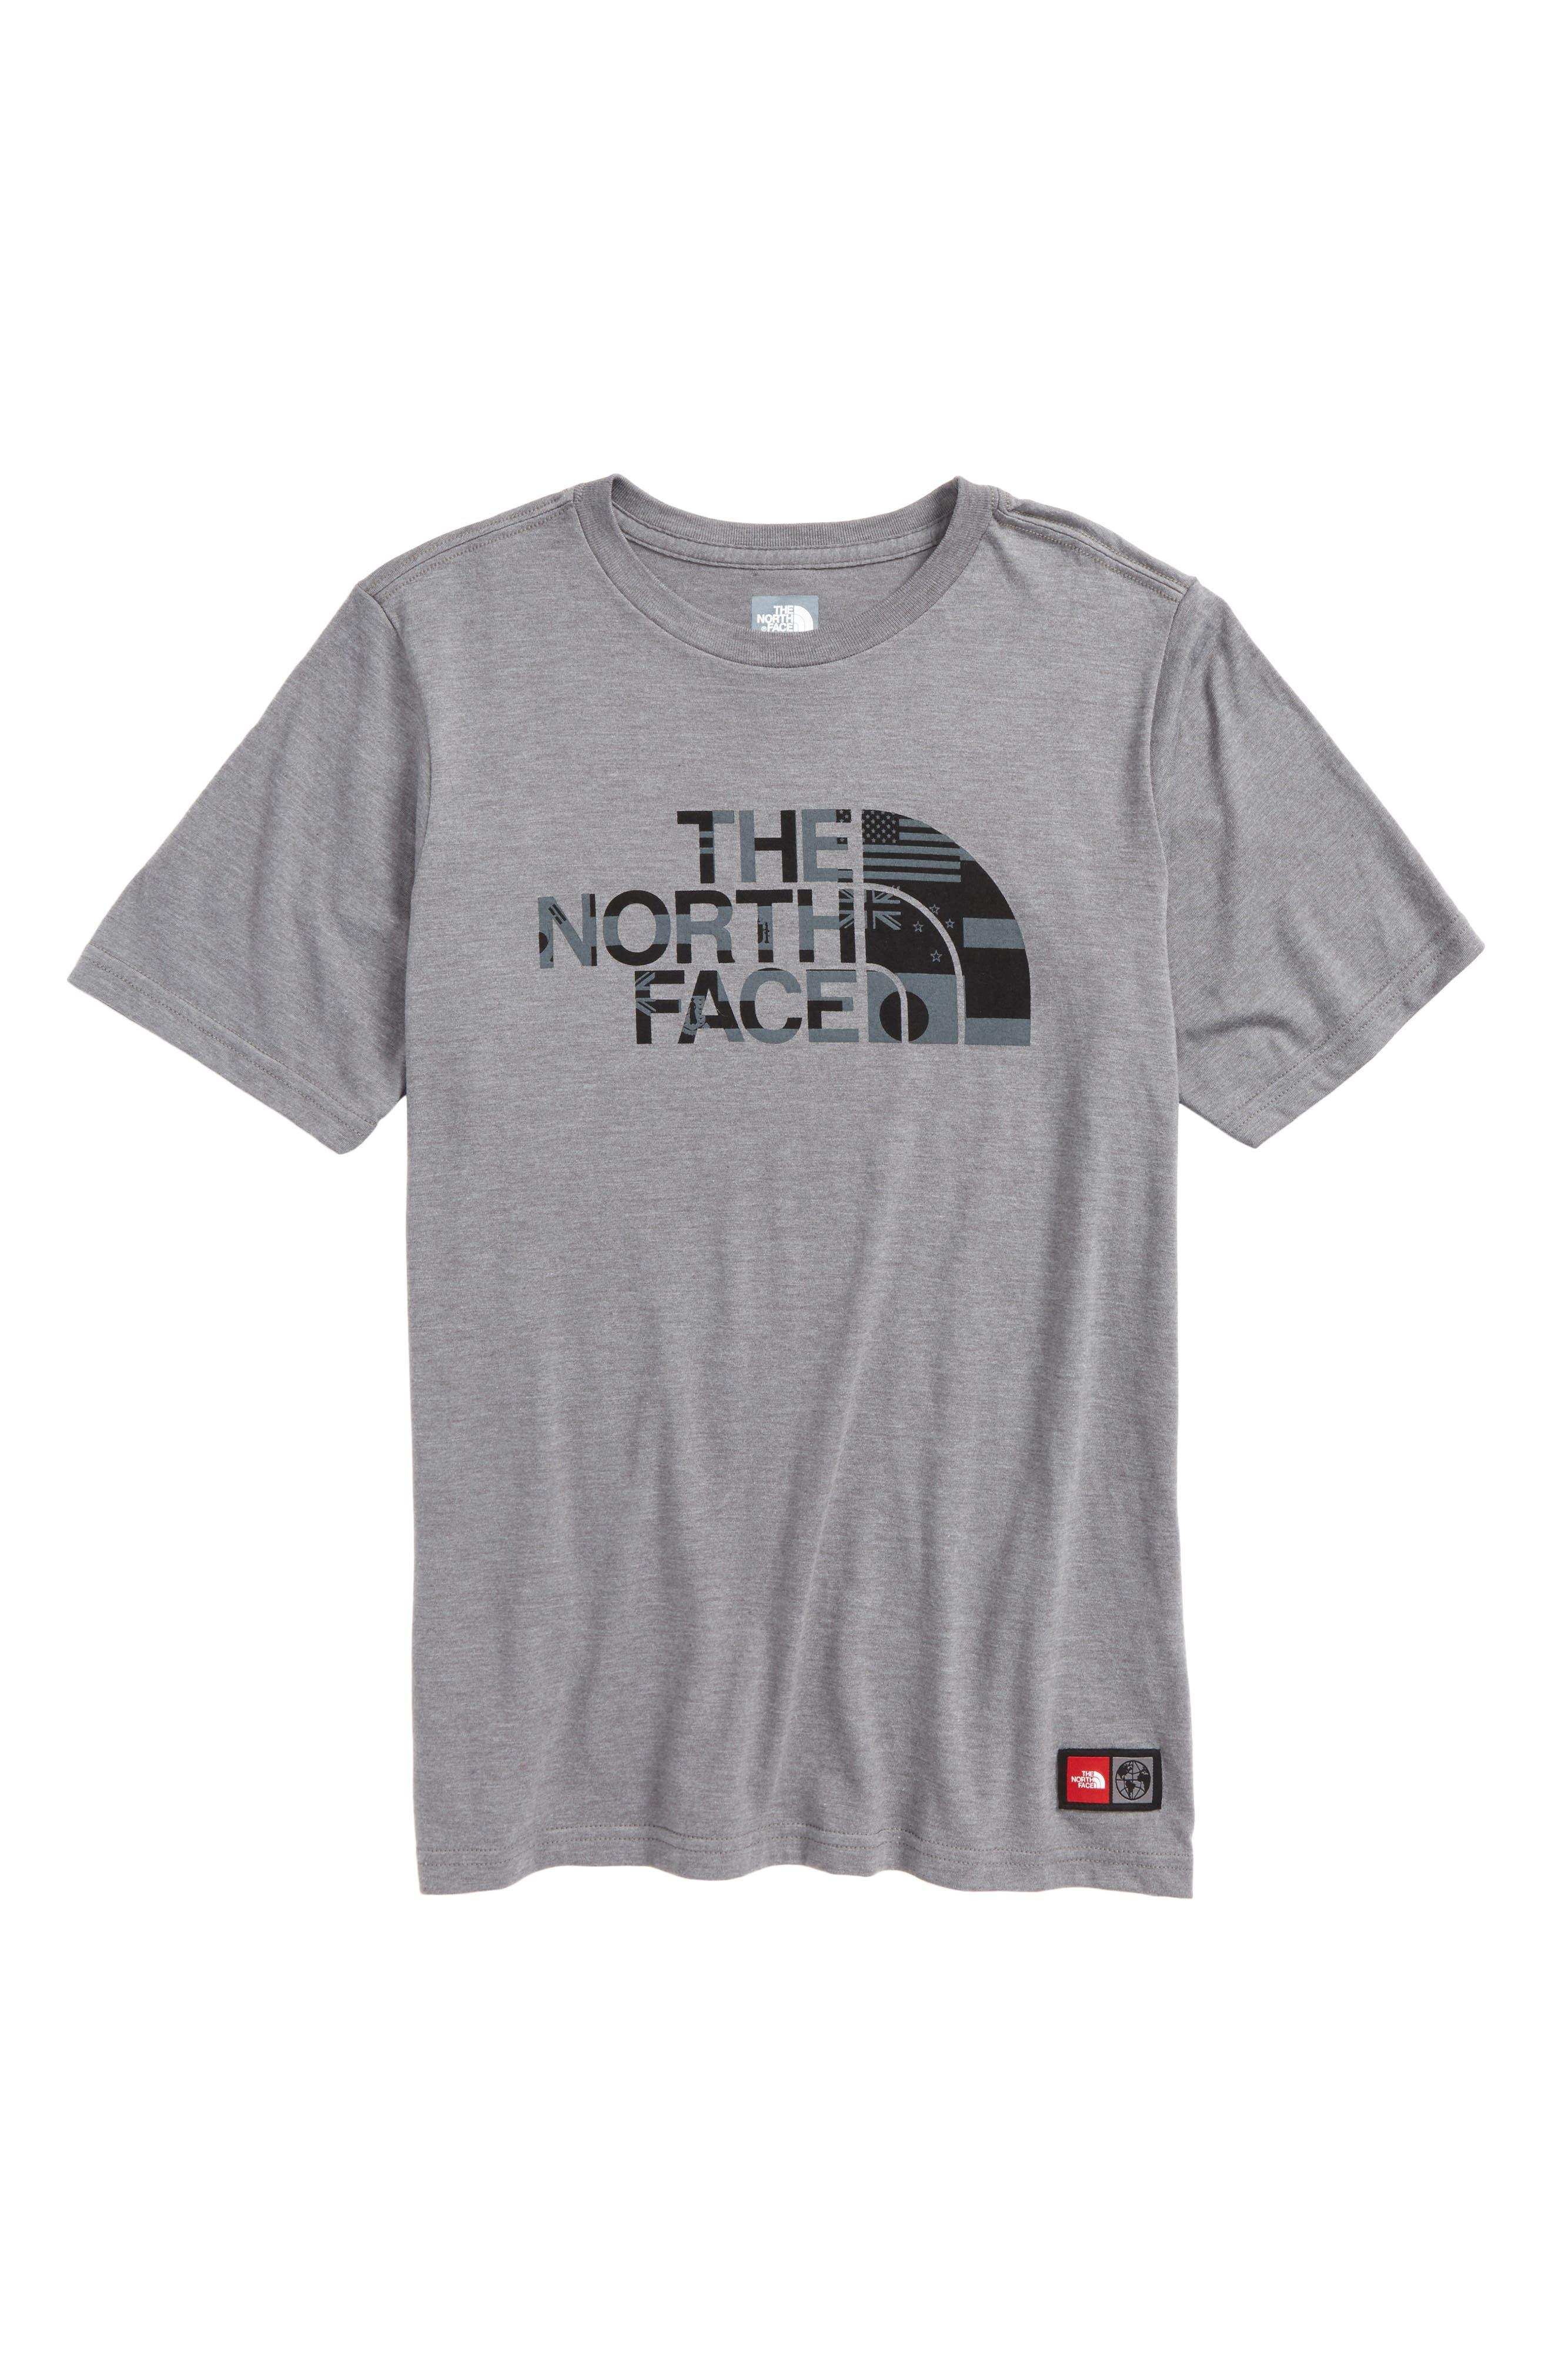 International Collection T-Shirt,                         Main,                         color, Tnf Medium Grey Heather